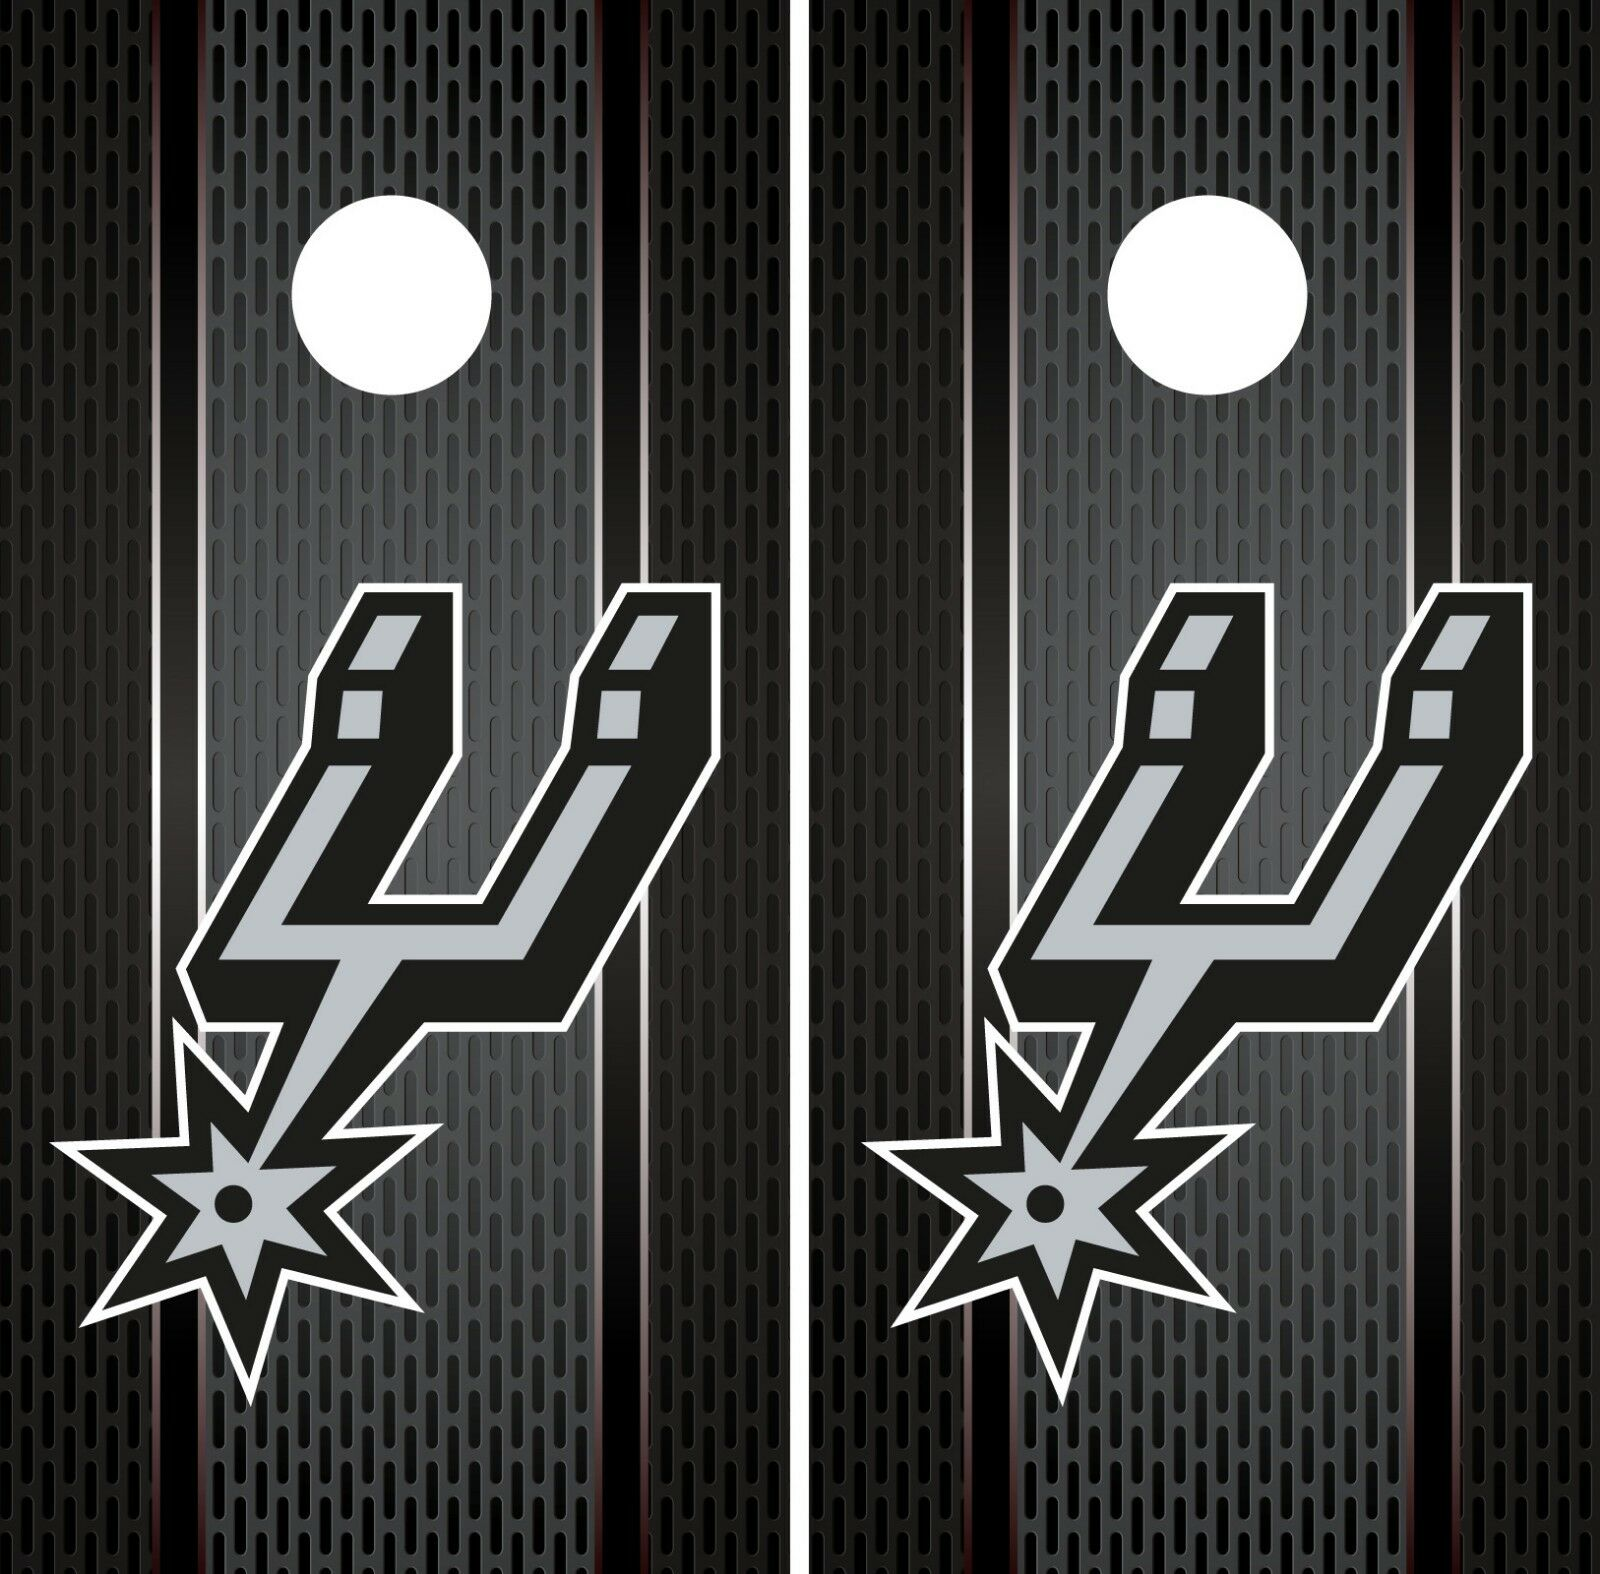 San Antonio Spurs Cornhole Wrap NBA Game  Skin Board Vinyl Decal Luxury Set CO711  online shopping